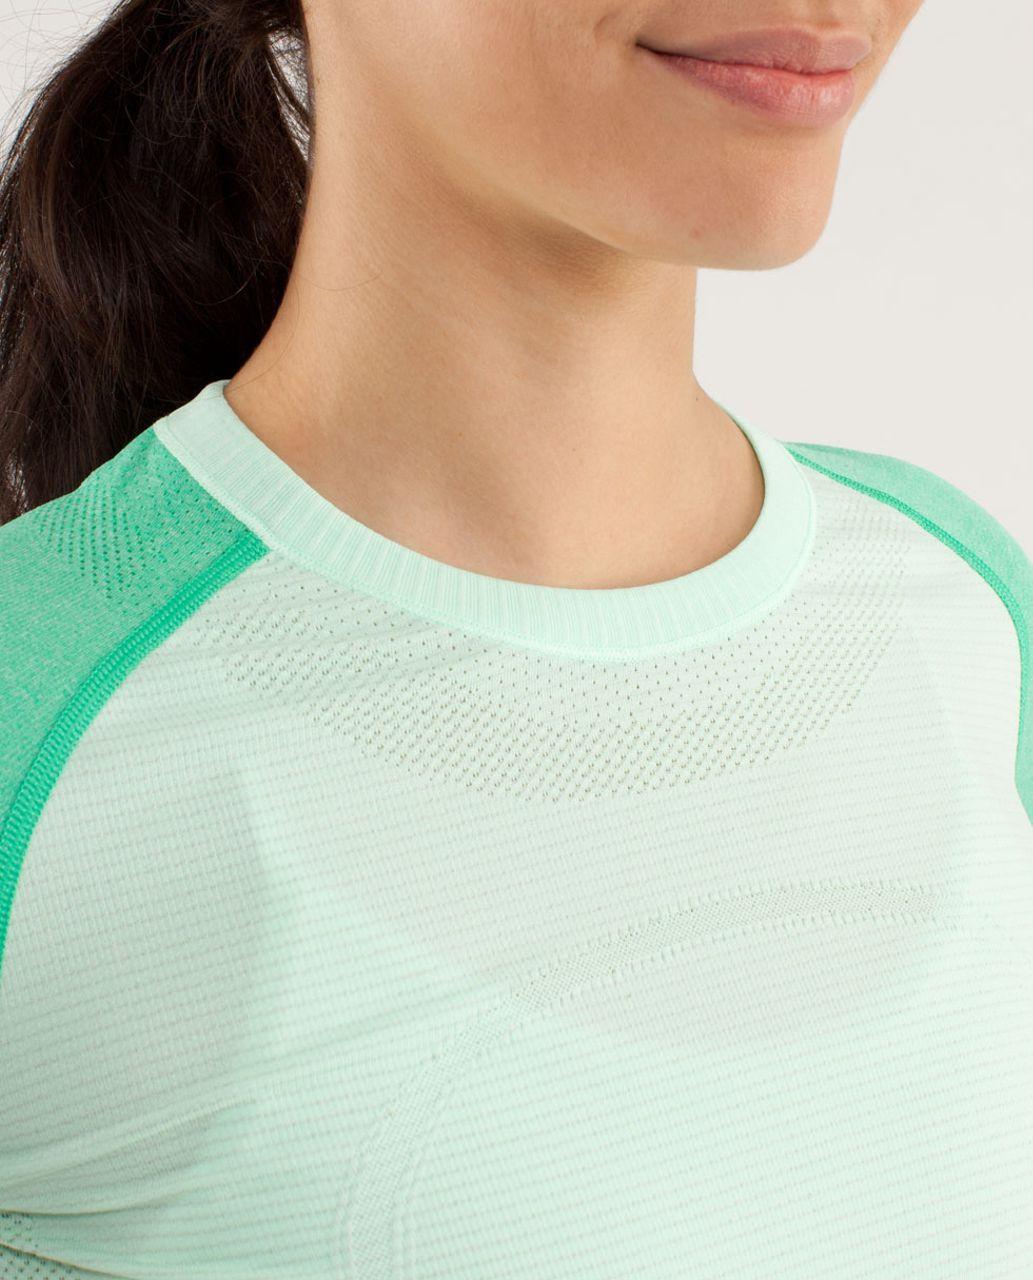 Lululemon Run:  Swiftly Tech Long Sleeve - Fresh Teal / Very Green